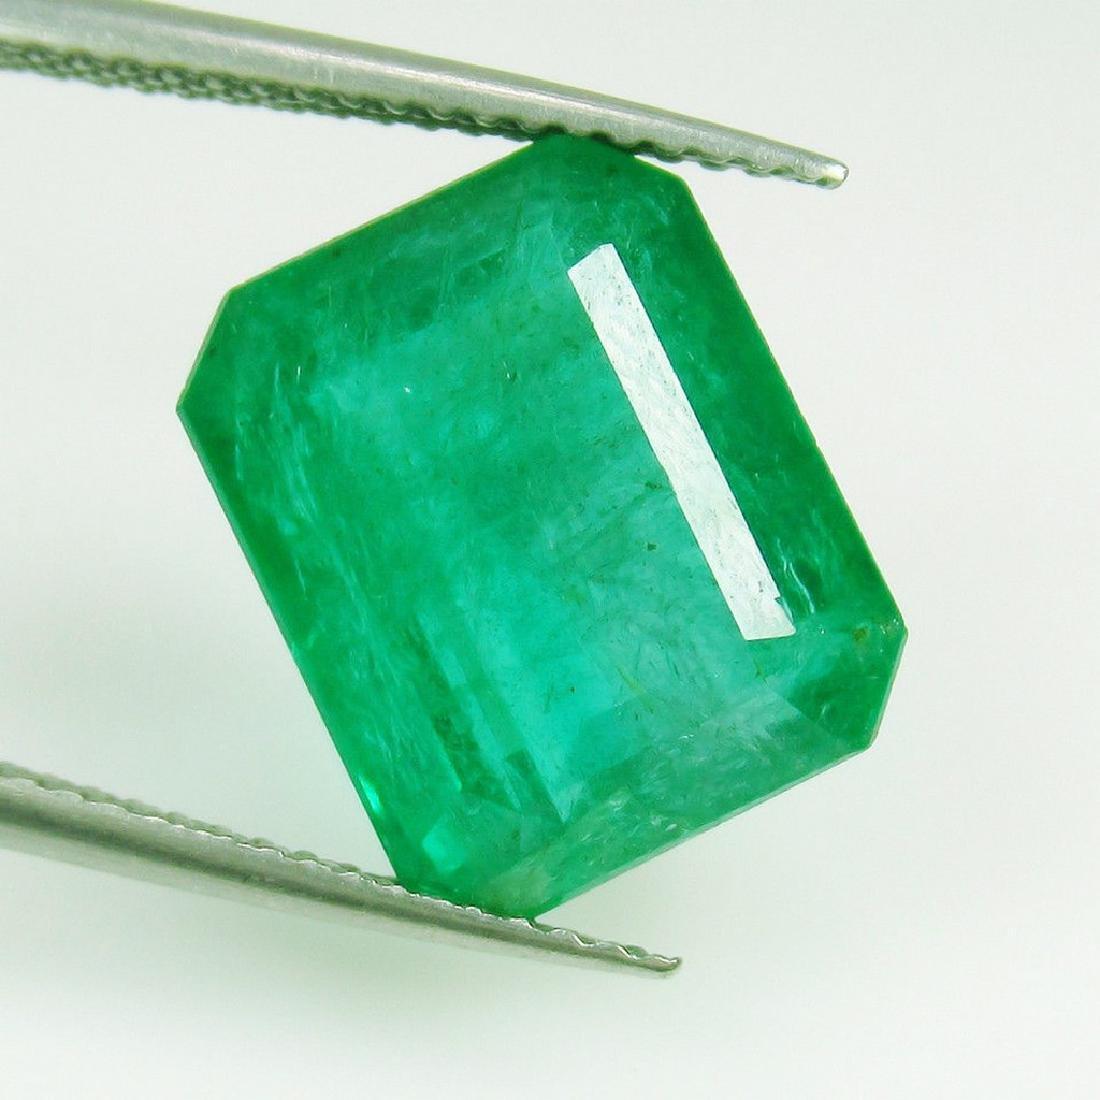 6.96 Ctw Natural Zambian Emerald 13X10.5 mm Octagon Cut